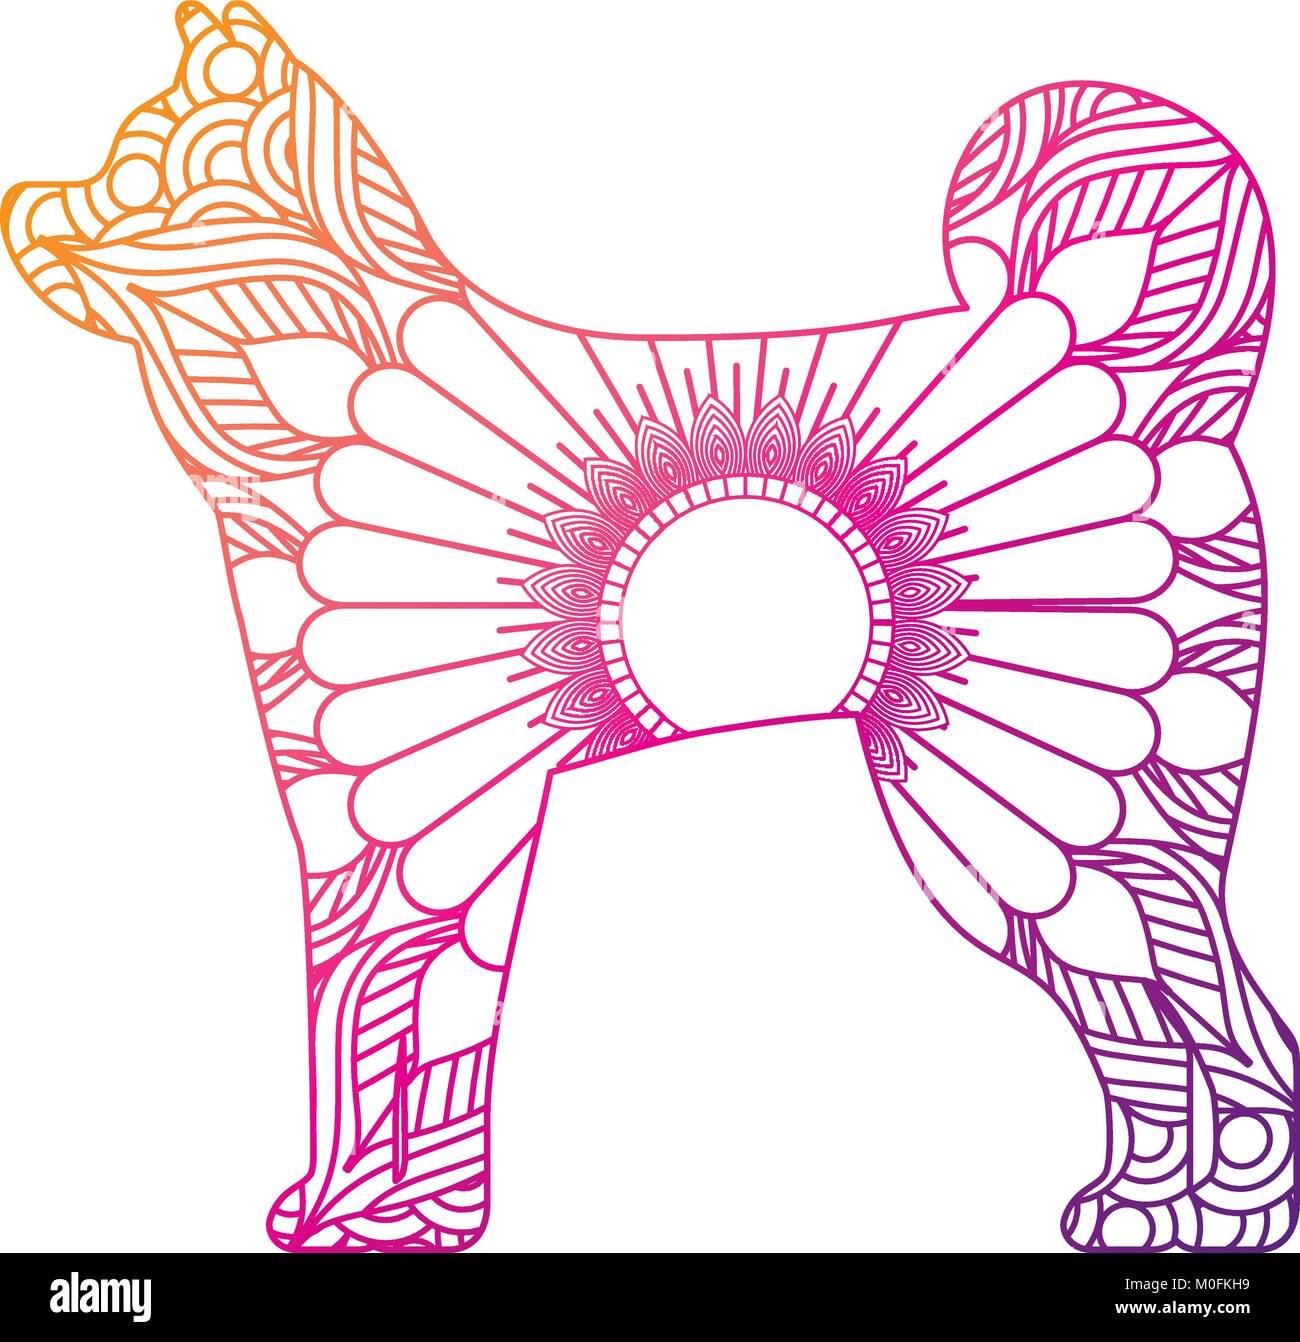 Doodle Dog Stock Photos & Doodle Dog Stock Images - Alamy